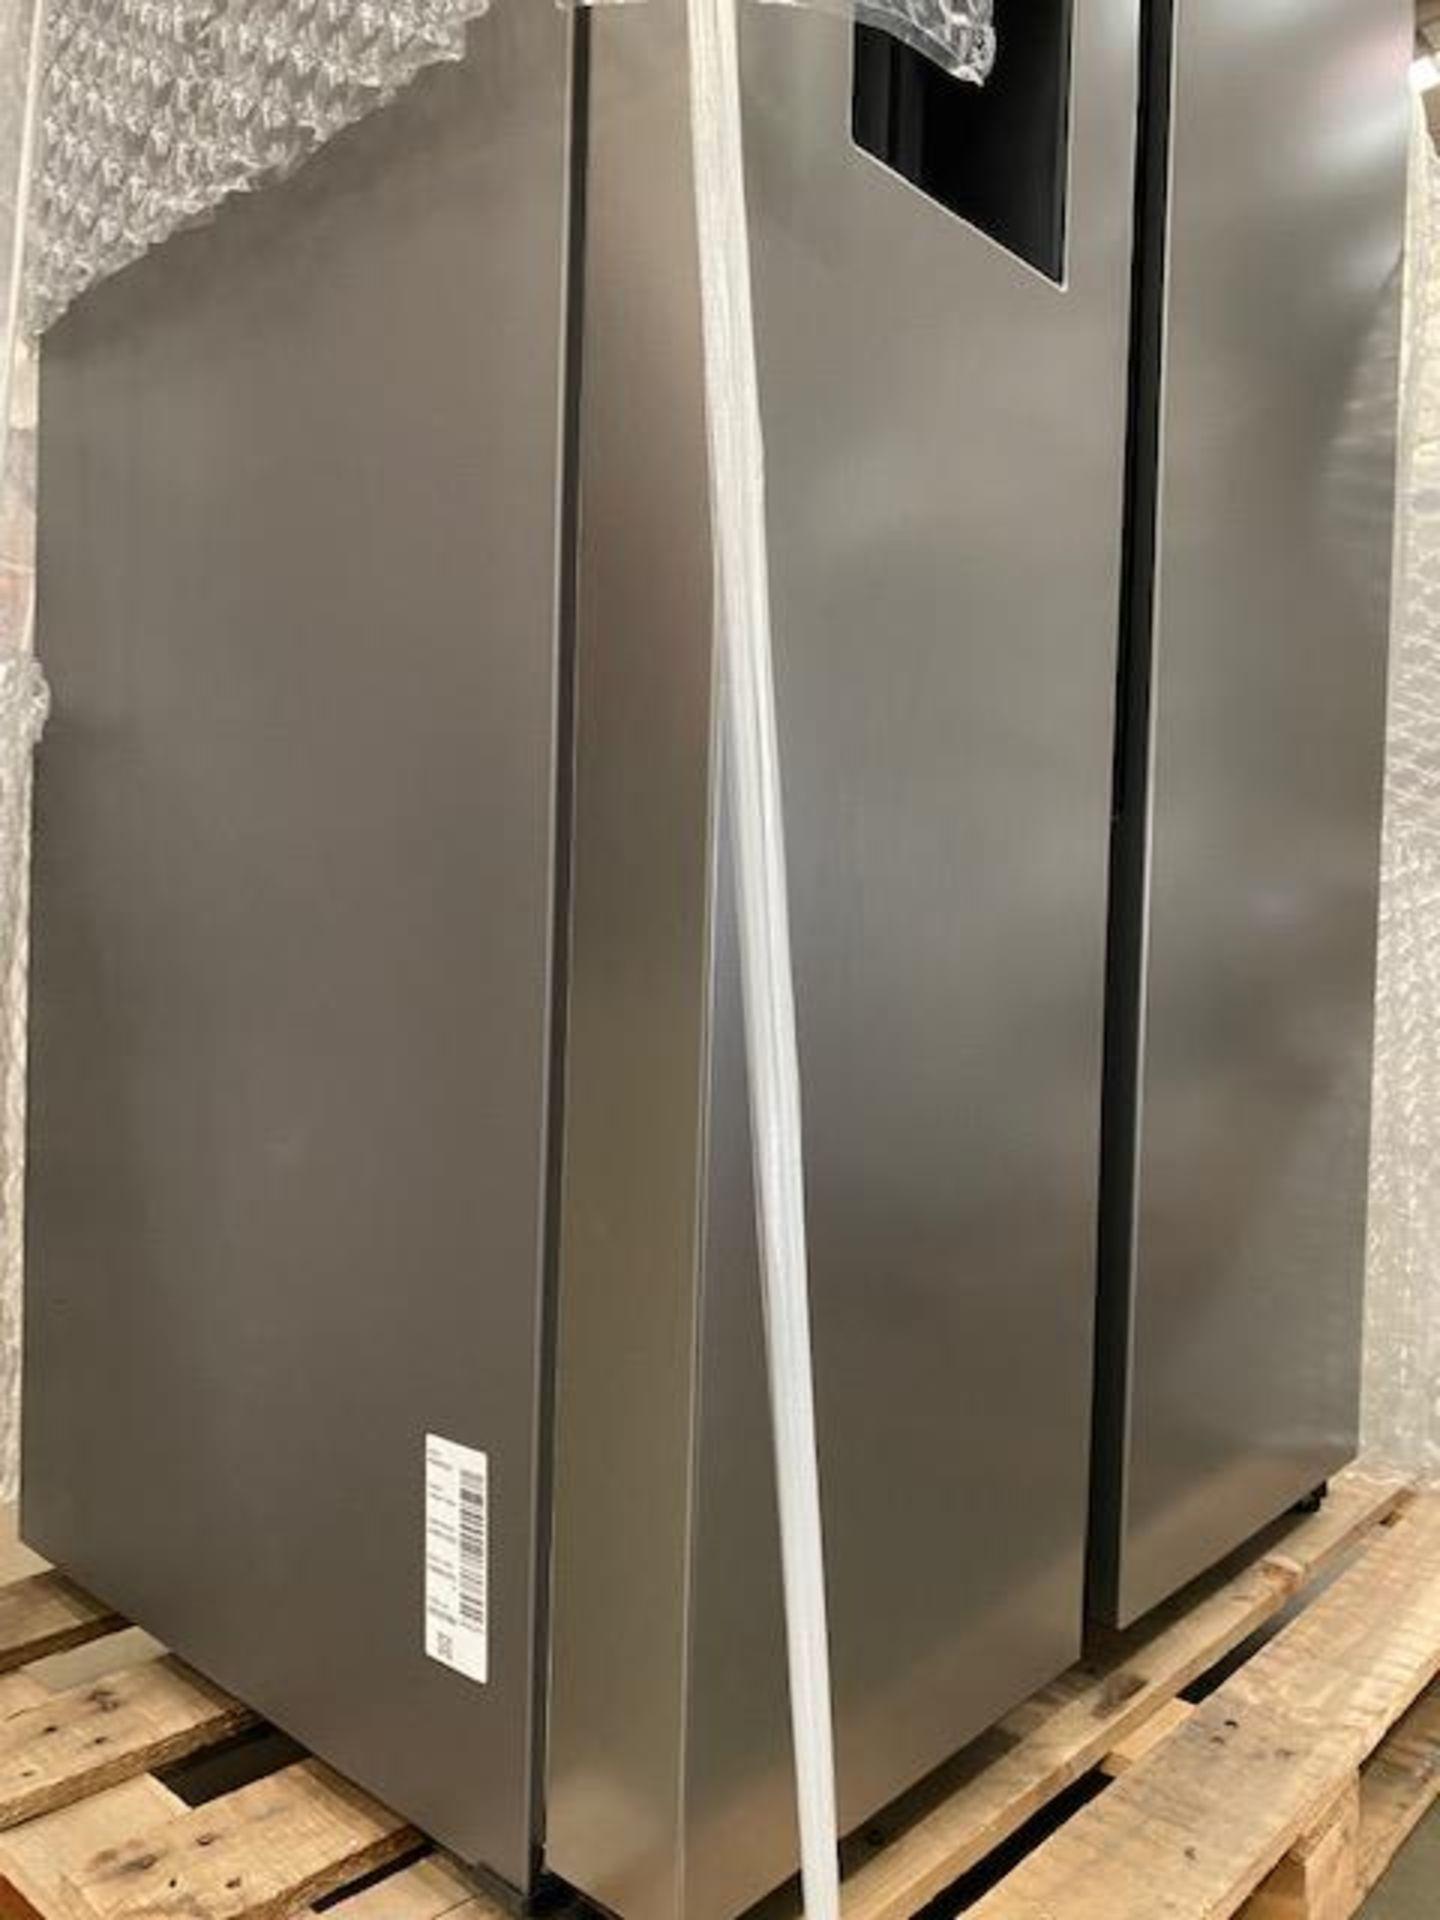 Pallet of 1 Samsung Water & Ice Fridge freezer. Latest selling price £1,329.99* - Image 8 of 9